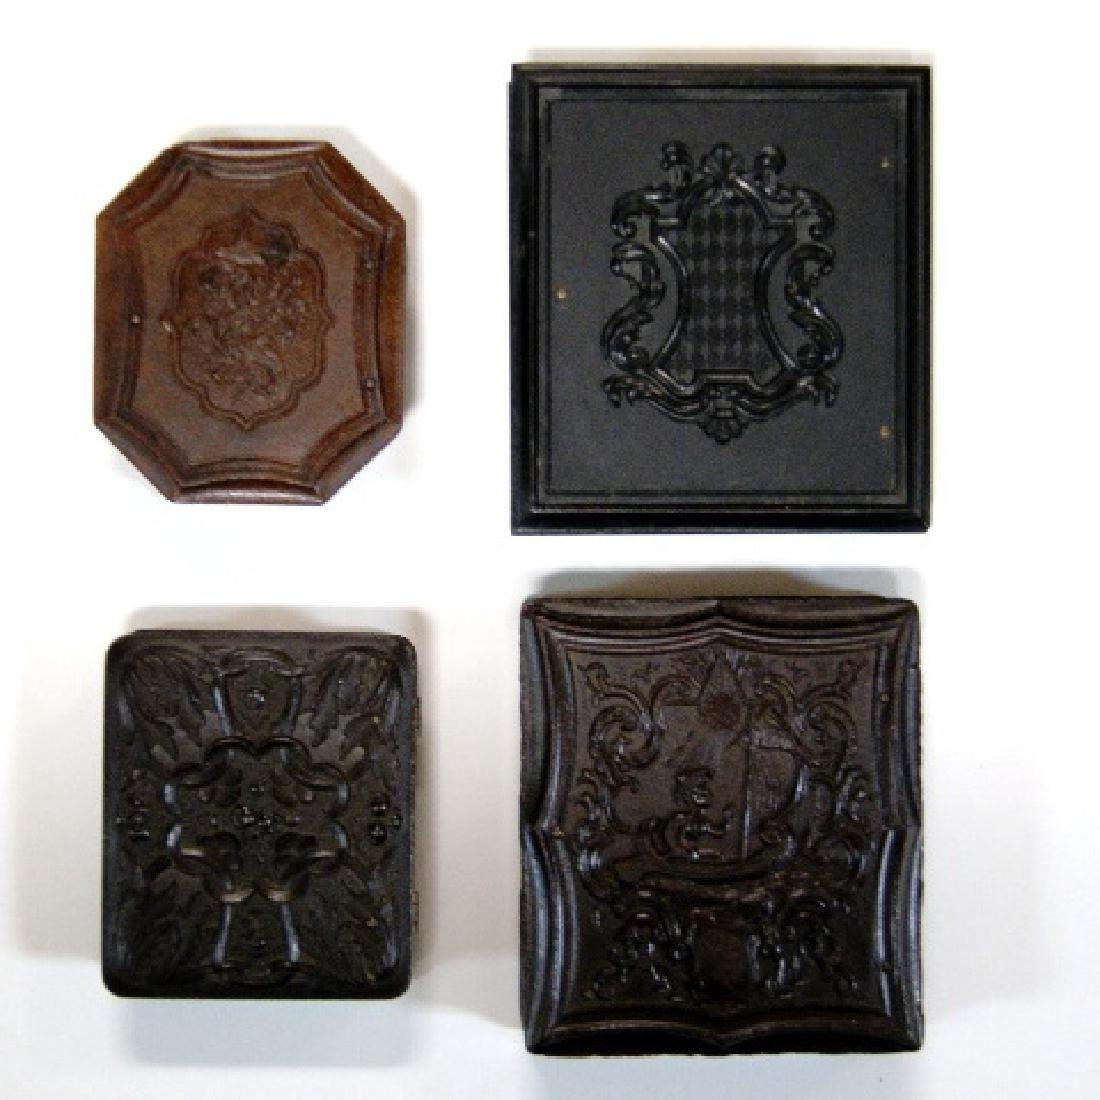 Cased 19th Century Photographs - 3